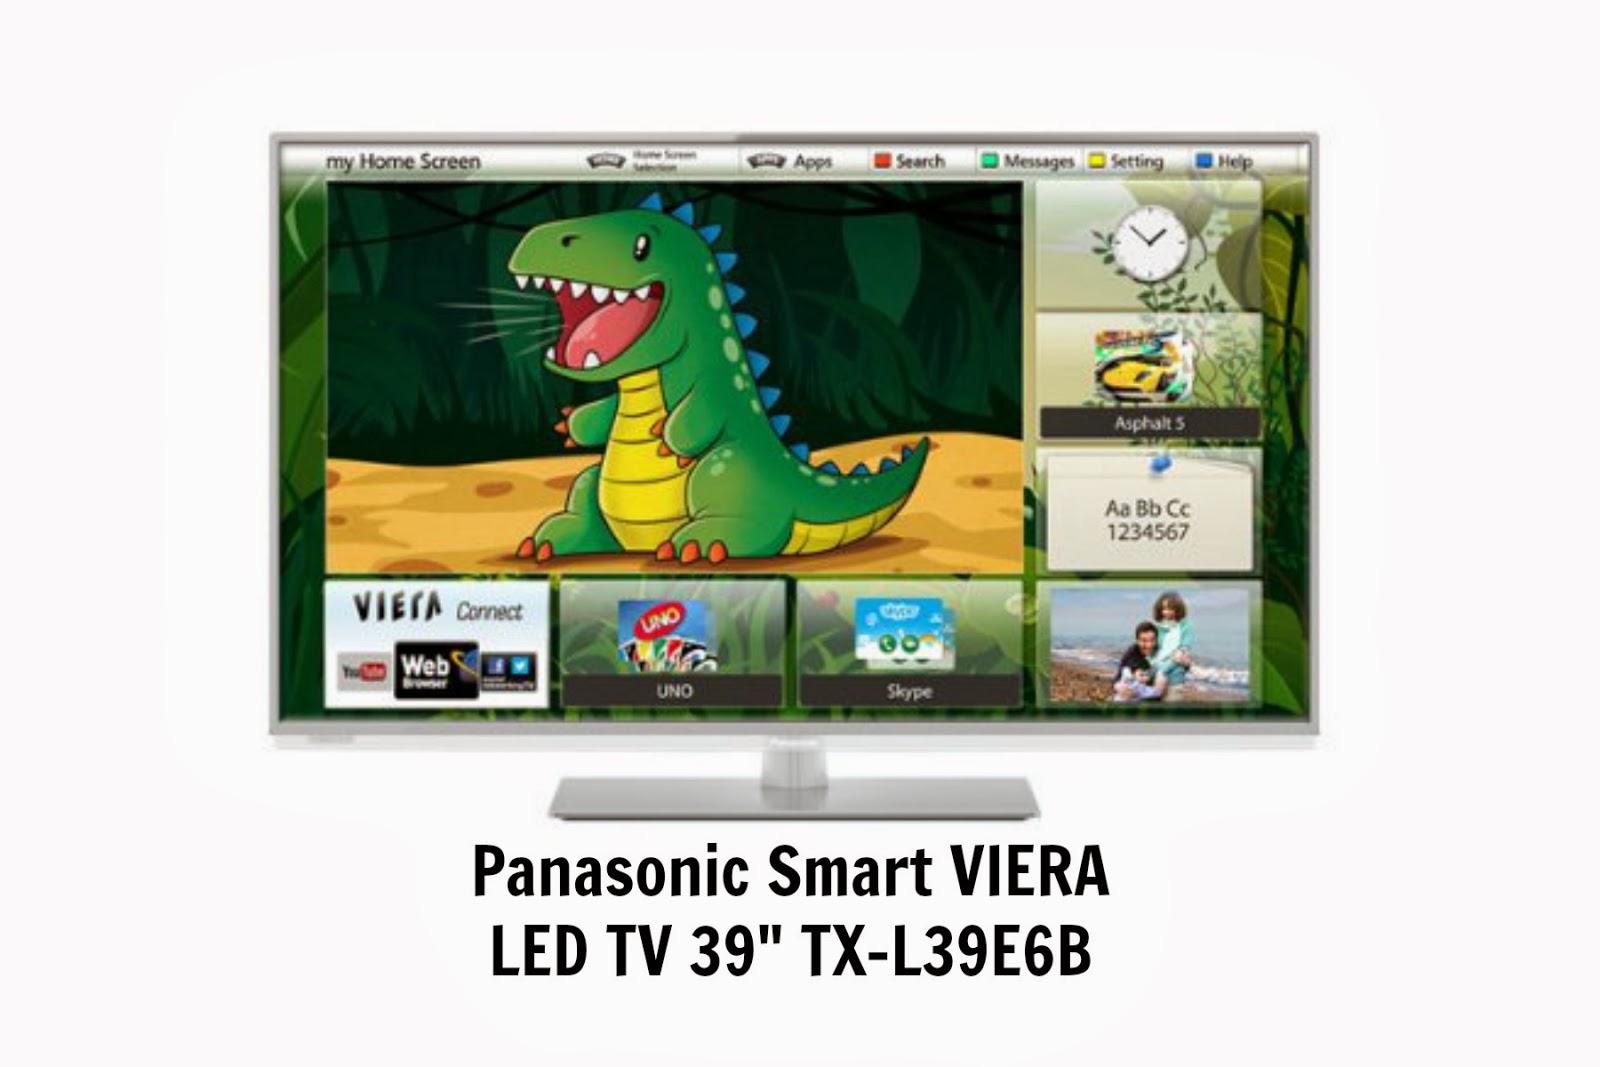 "Panasonic Smart VIERA LED TV 39"" TX-L39E6B {#Review}"